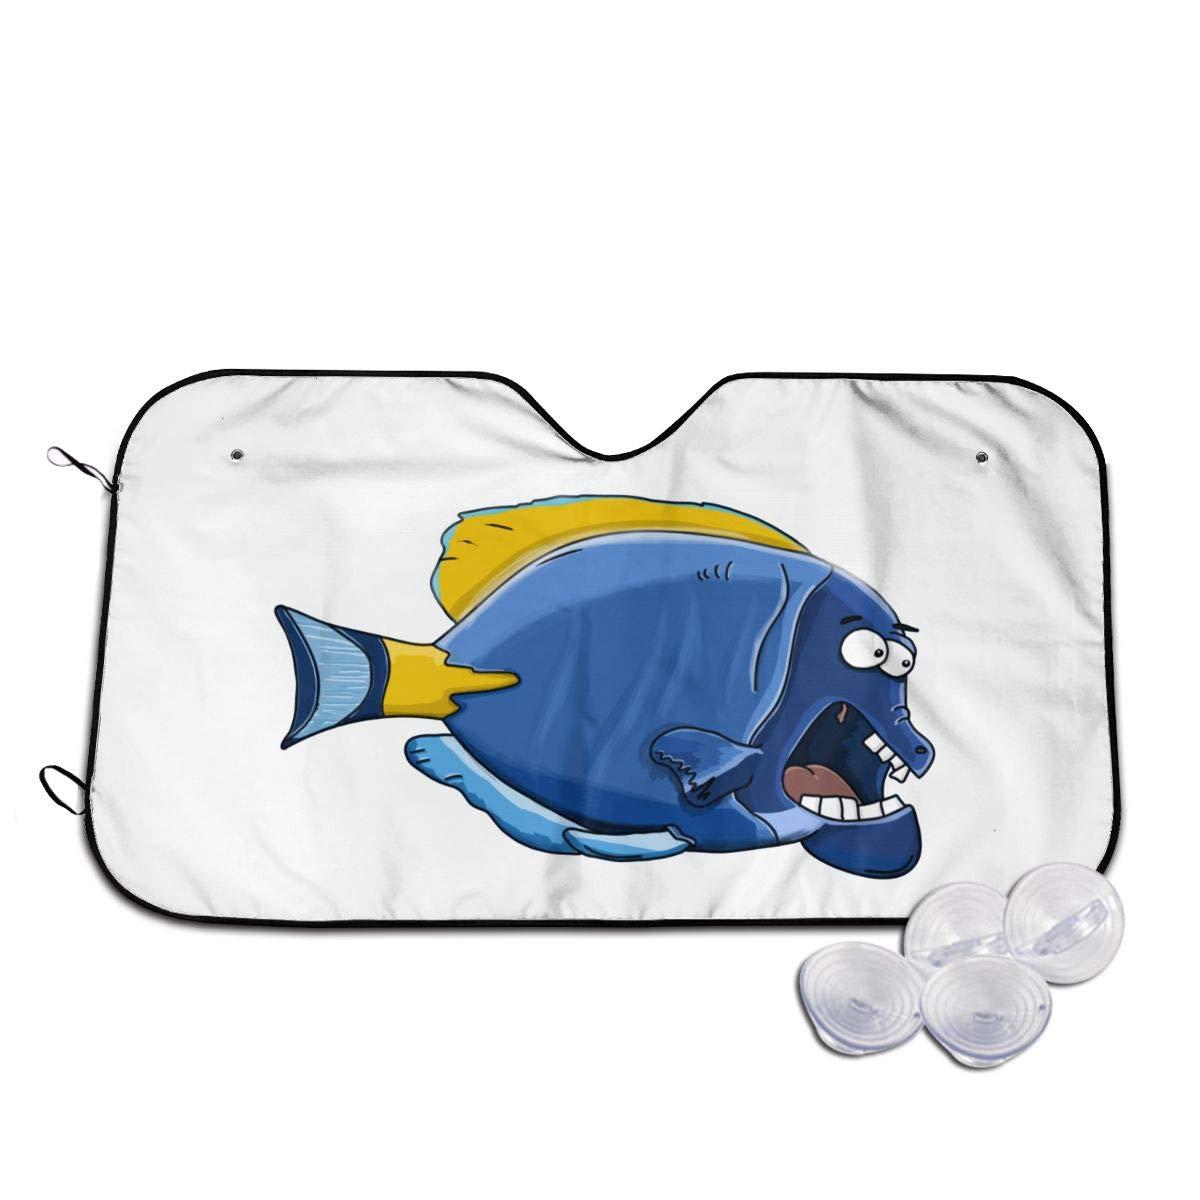 Car Popular Outlet ☆ Free Shipping standard Windshield Sunshade Auto Sun Aquarium Sunshad Fish Visor